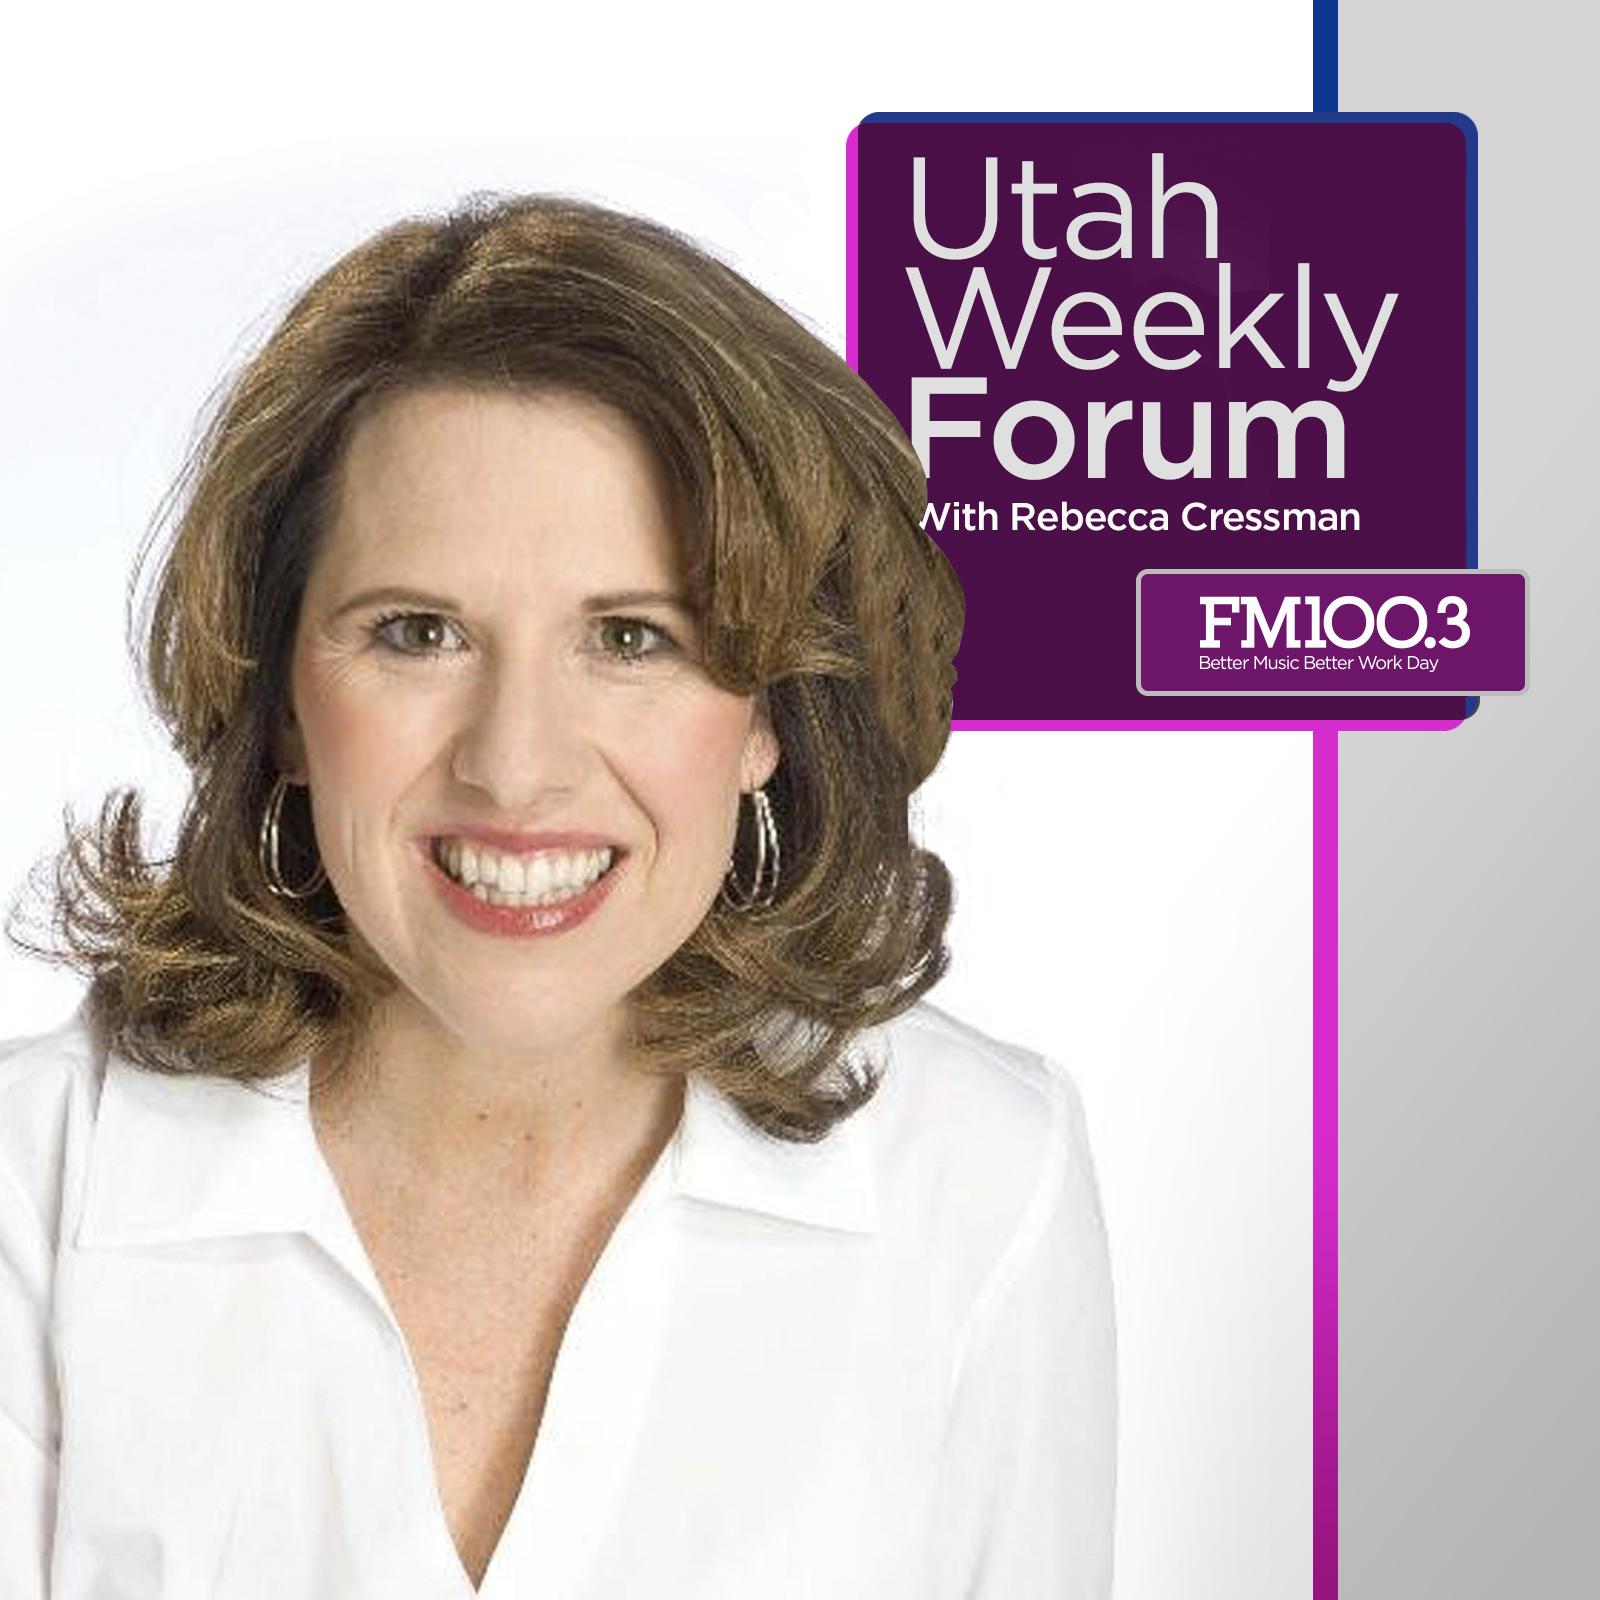 Utah Weekly Forum with Rebecca Cressman show art